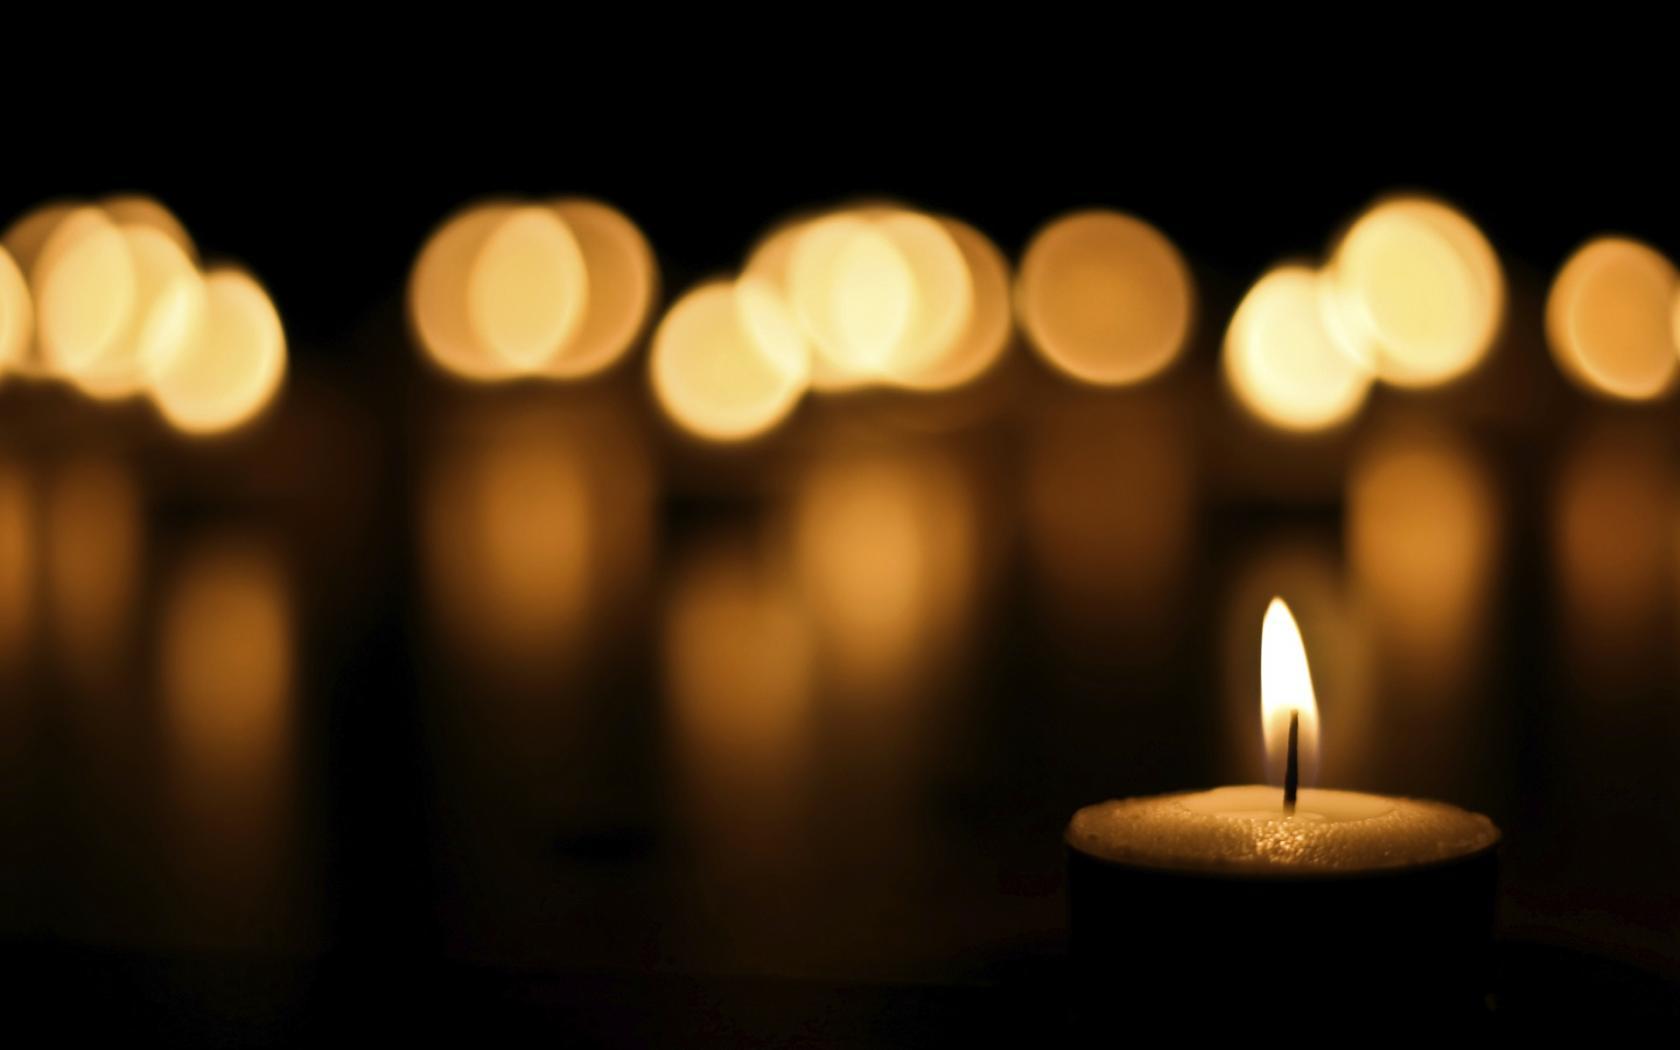 Candle-light-shine-desktop-background-1680x1050